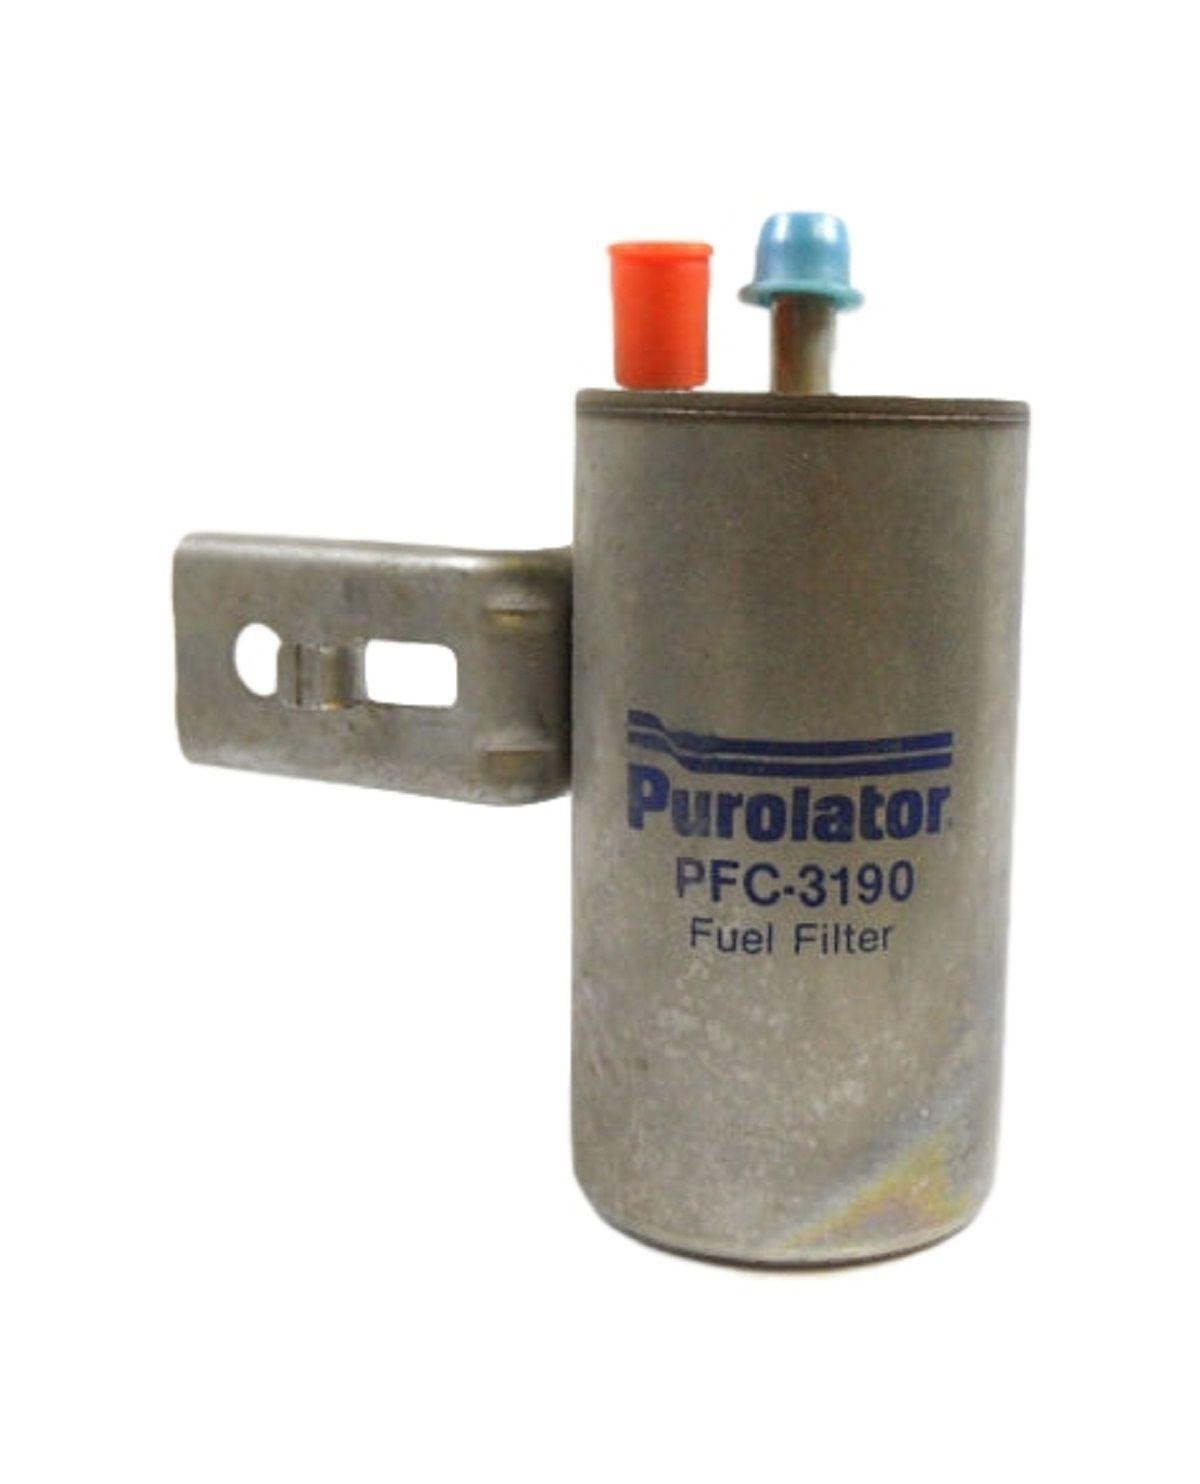 Responsive image. Purolator PFC-3190 Fuel Filter ...